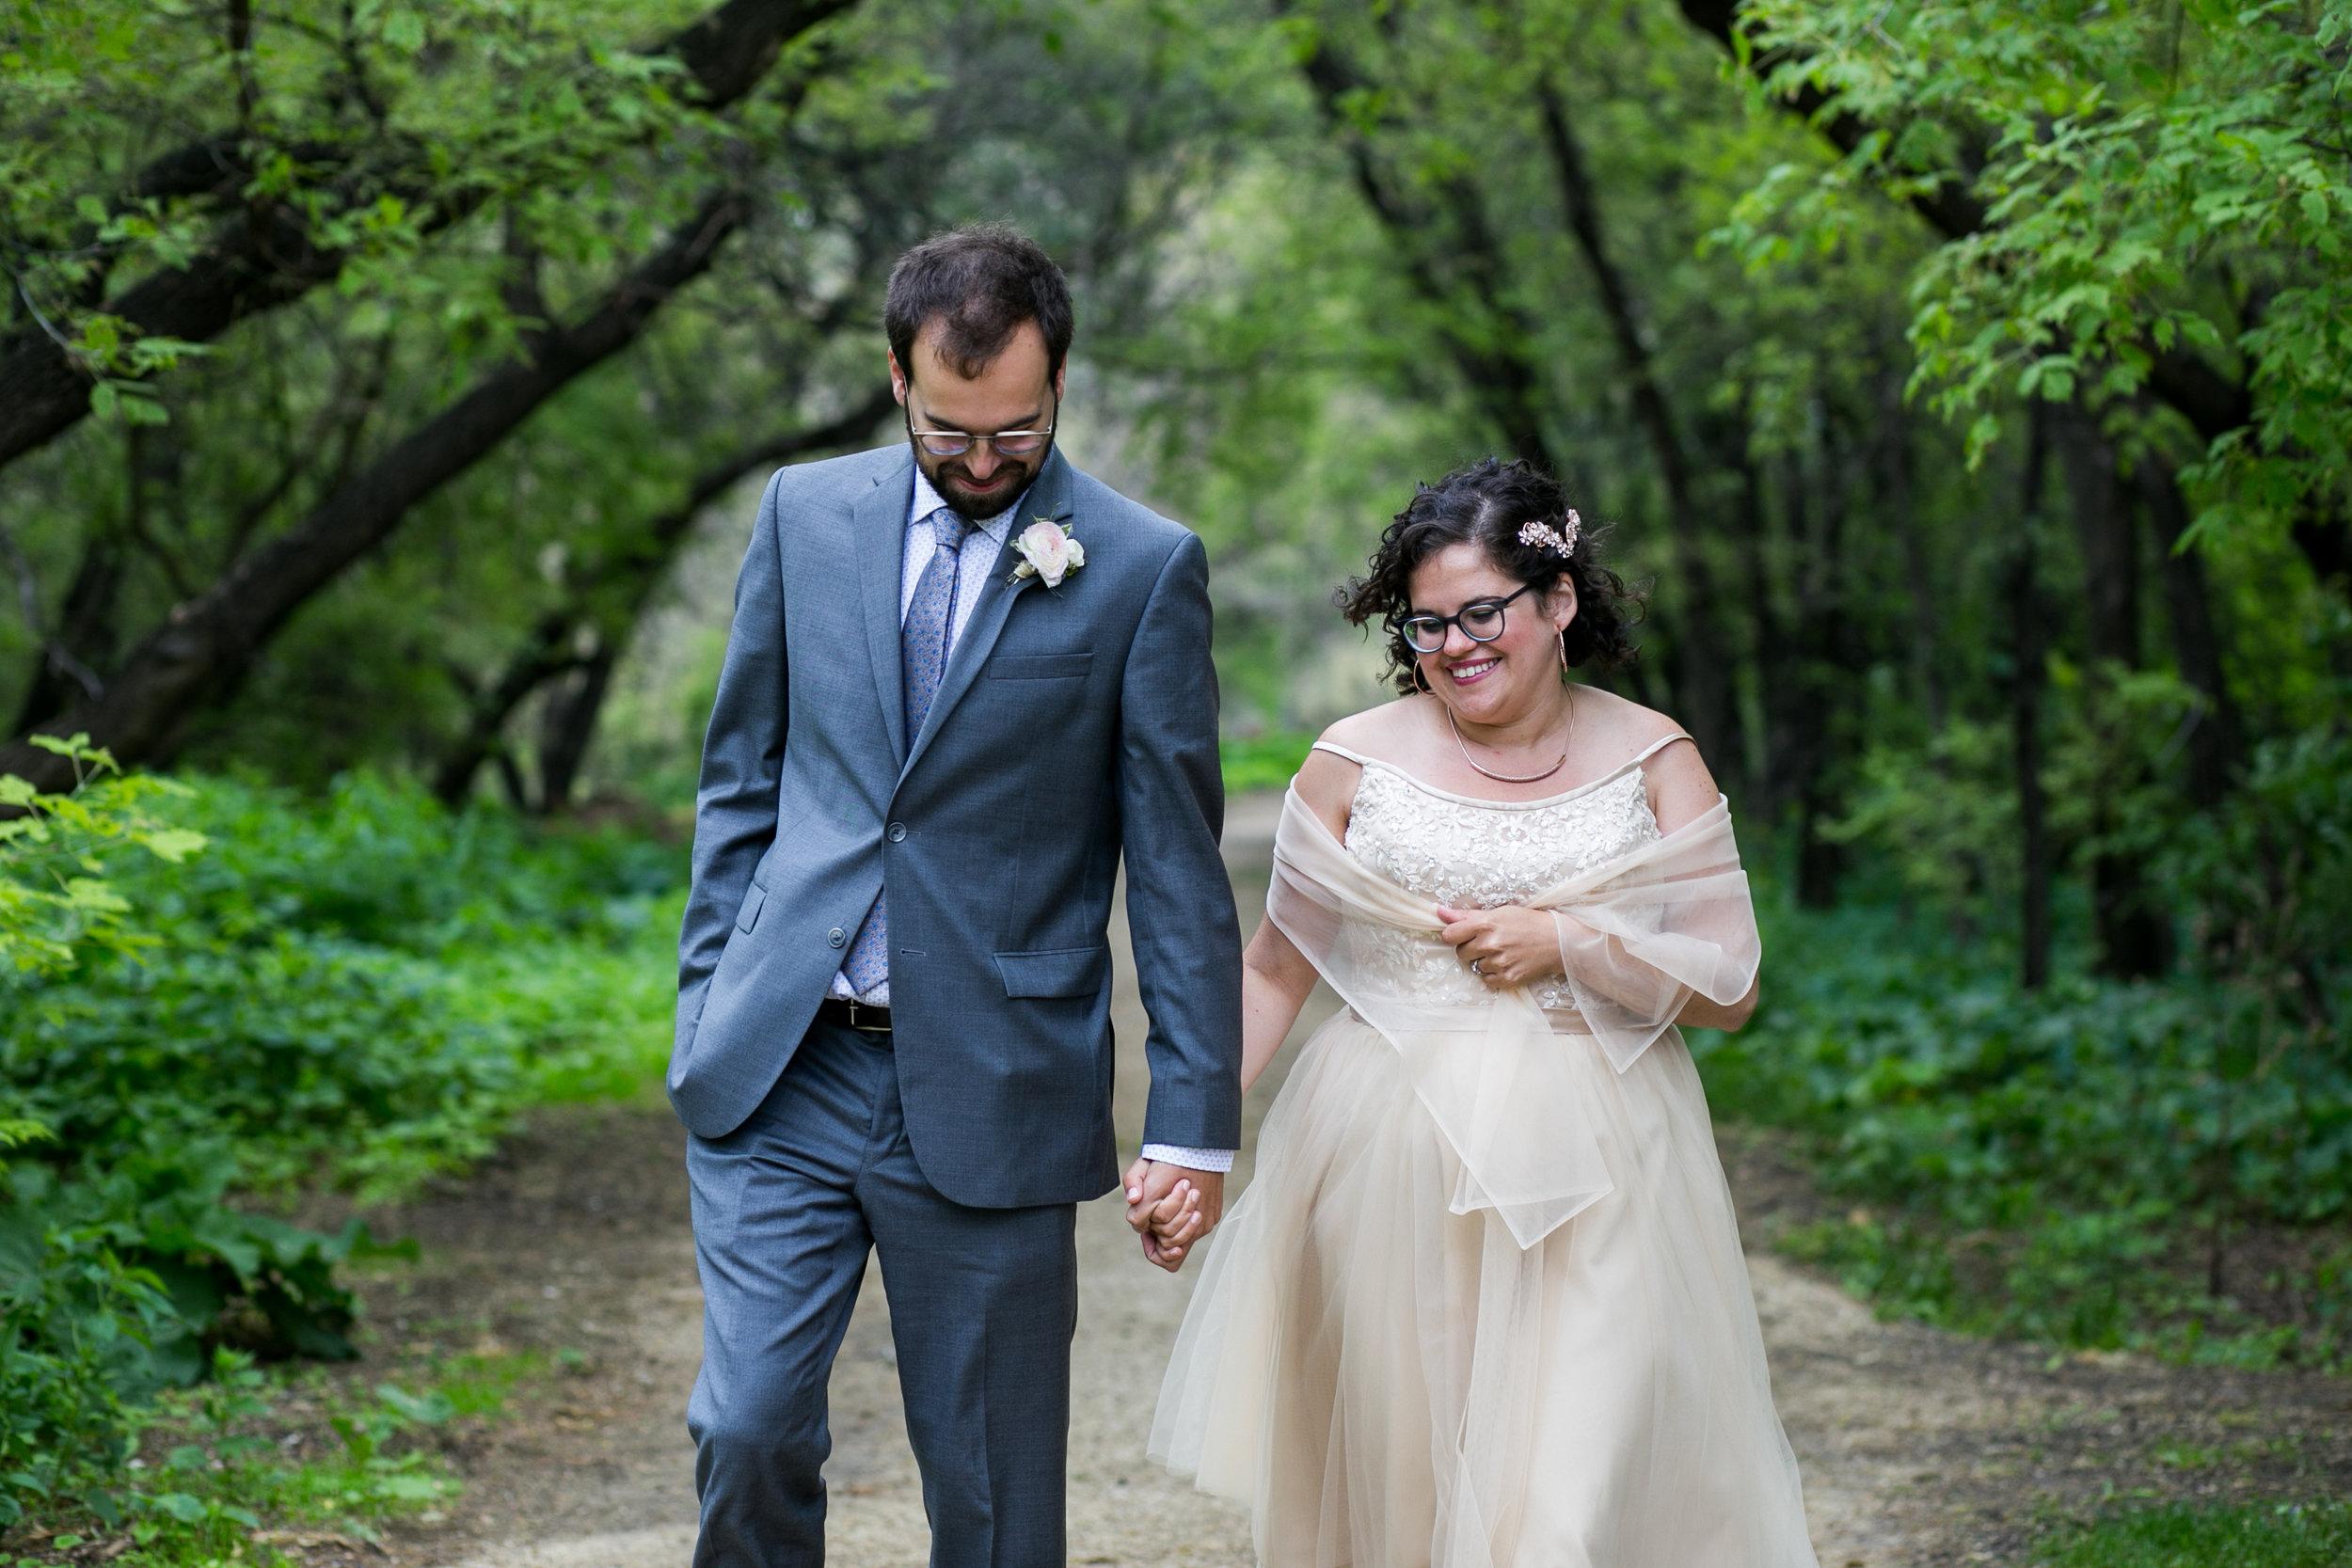 wedding pictures-271.jpg